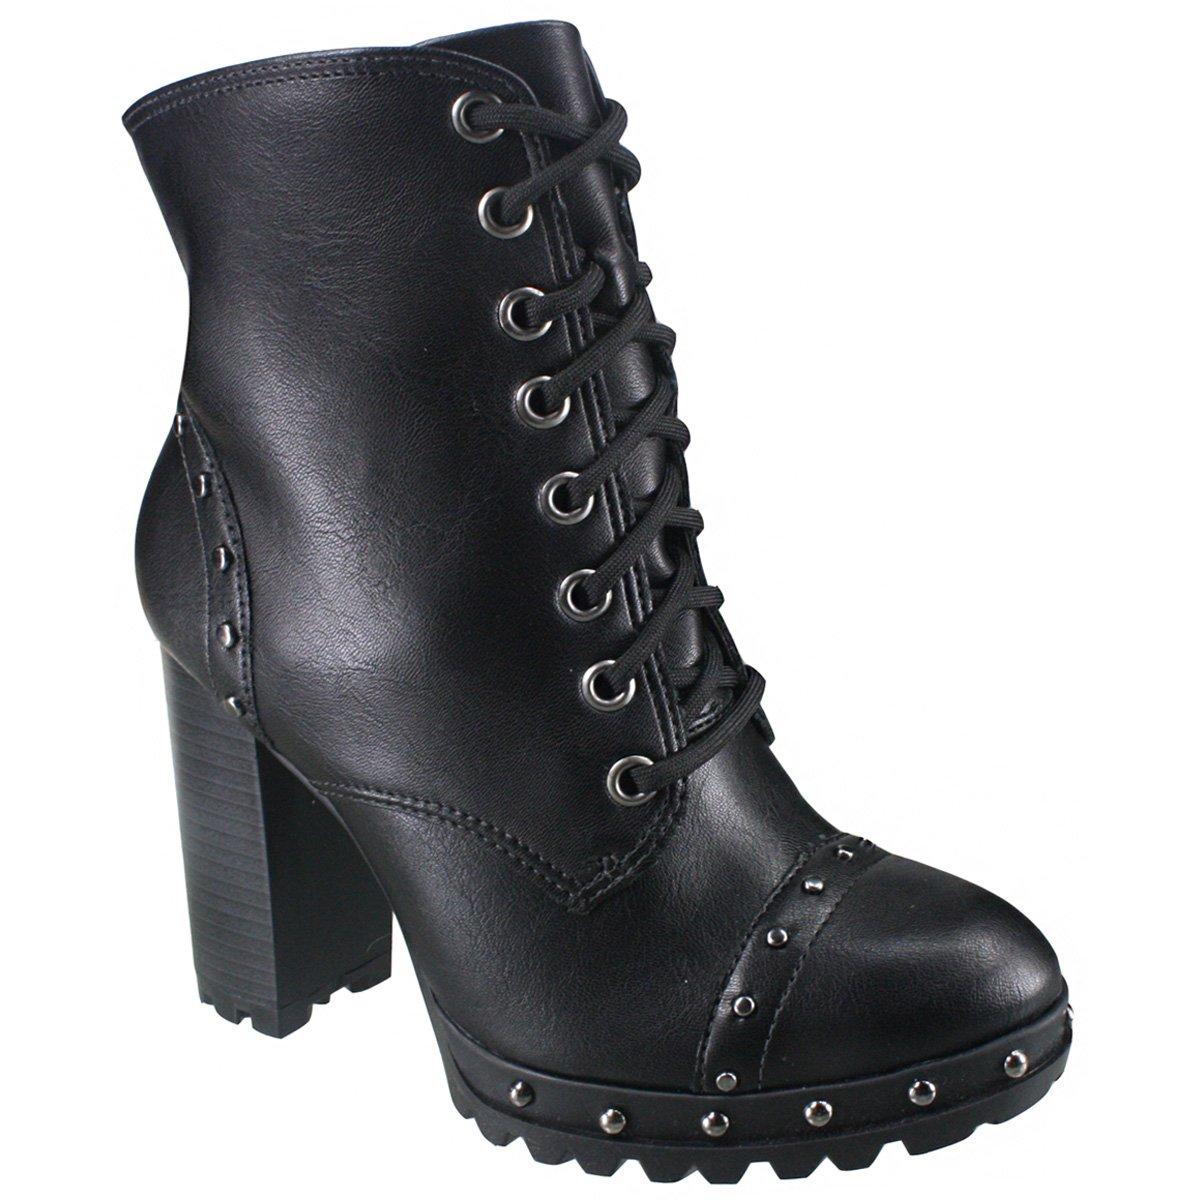 efb2715563d7 Bota Ankle Boot Ramarim 18-53104 - Preto (Naturale Plus) - Calçados ...